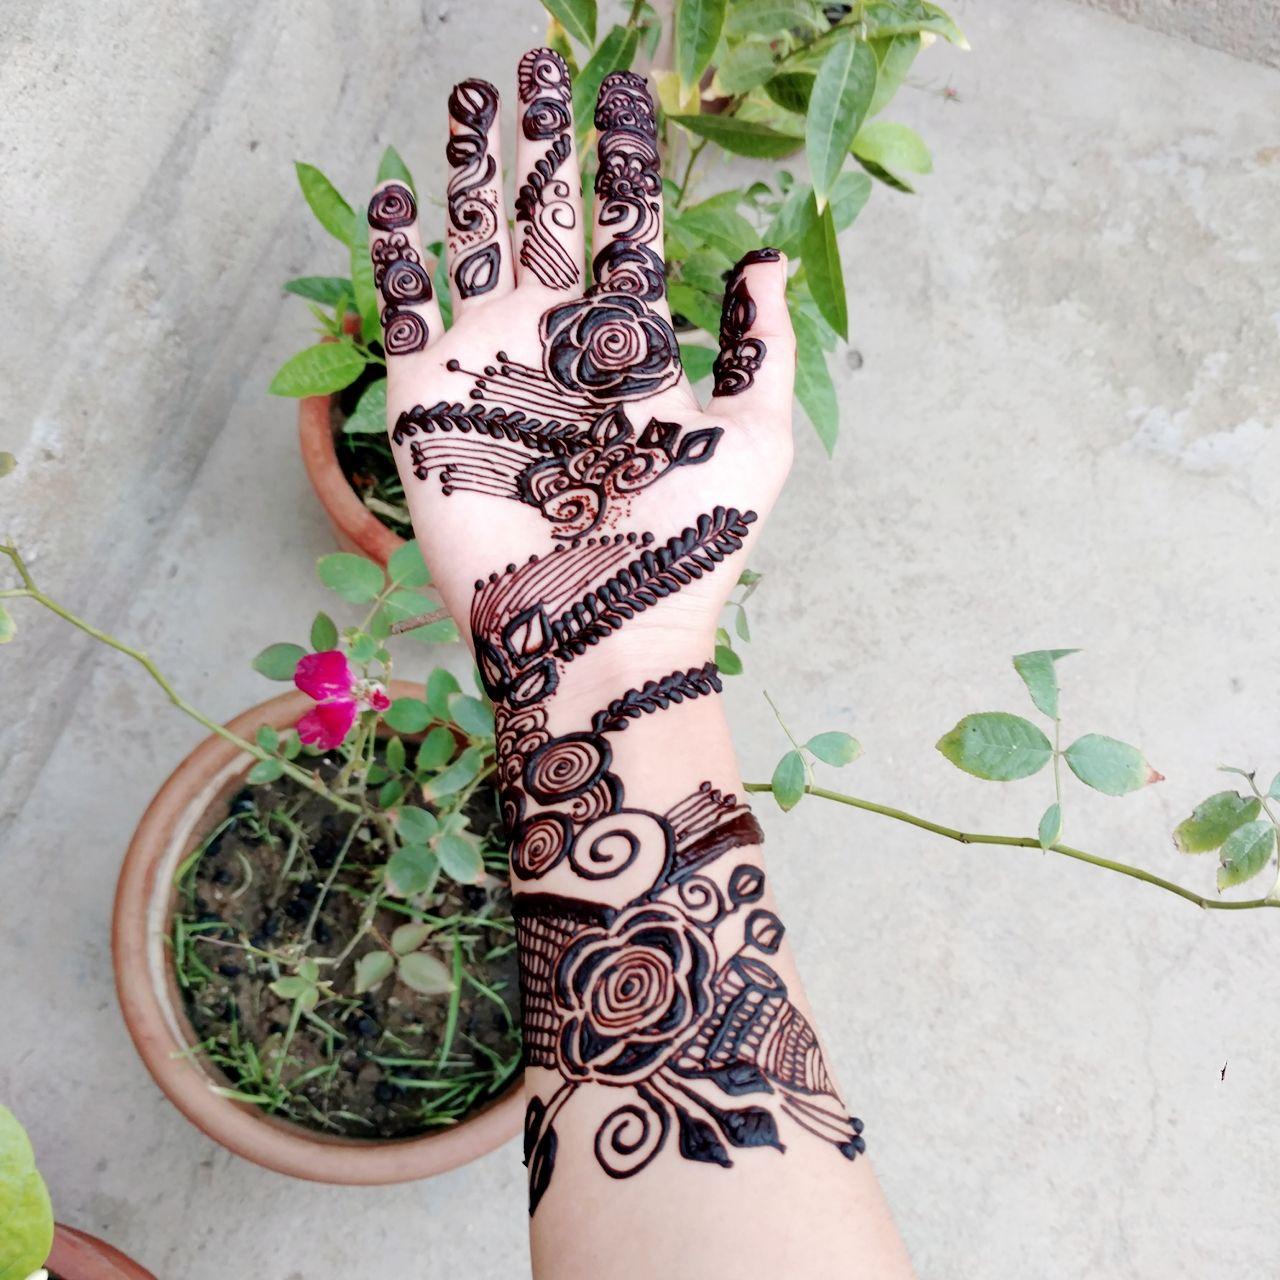 Stylish Rose Mehndi Design For Front Hand Simple Rose Mehndi Design By Mehndi Artist Noor Rose Mehndi Designs Simple Rose Lace Up Flat